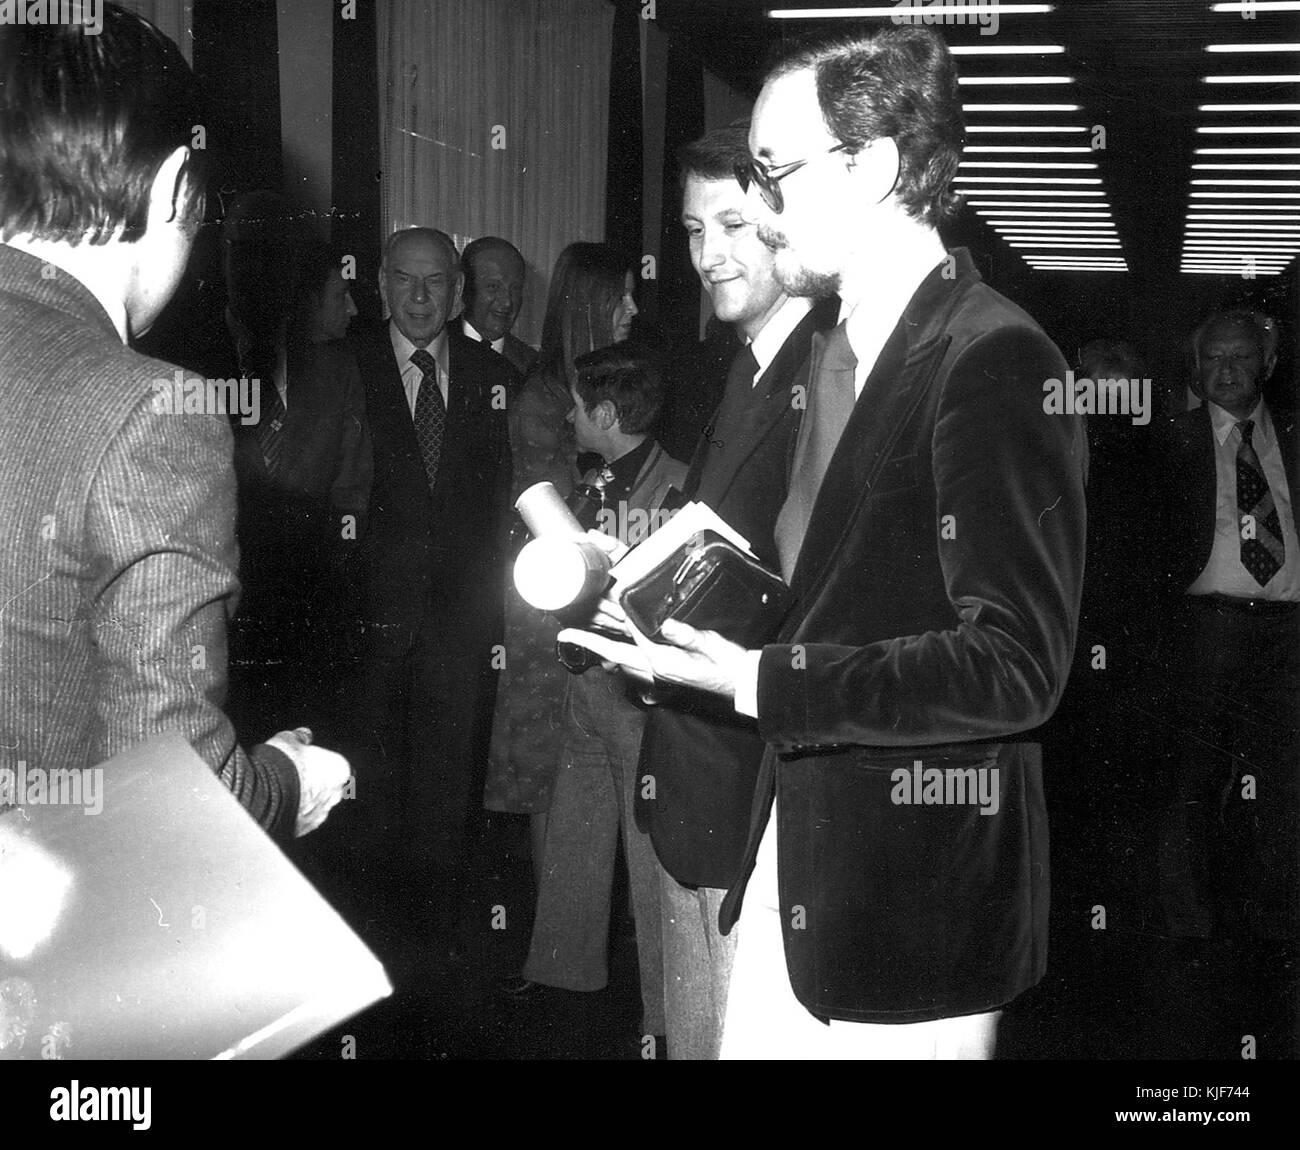 Goldene Pelzmotte 1976, Gerd Kursawe, Hans Quaet Faslem, Martin von Schachtmeyer (05) - Stock Image